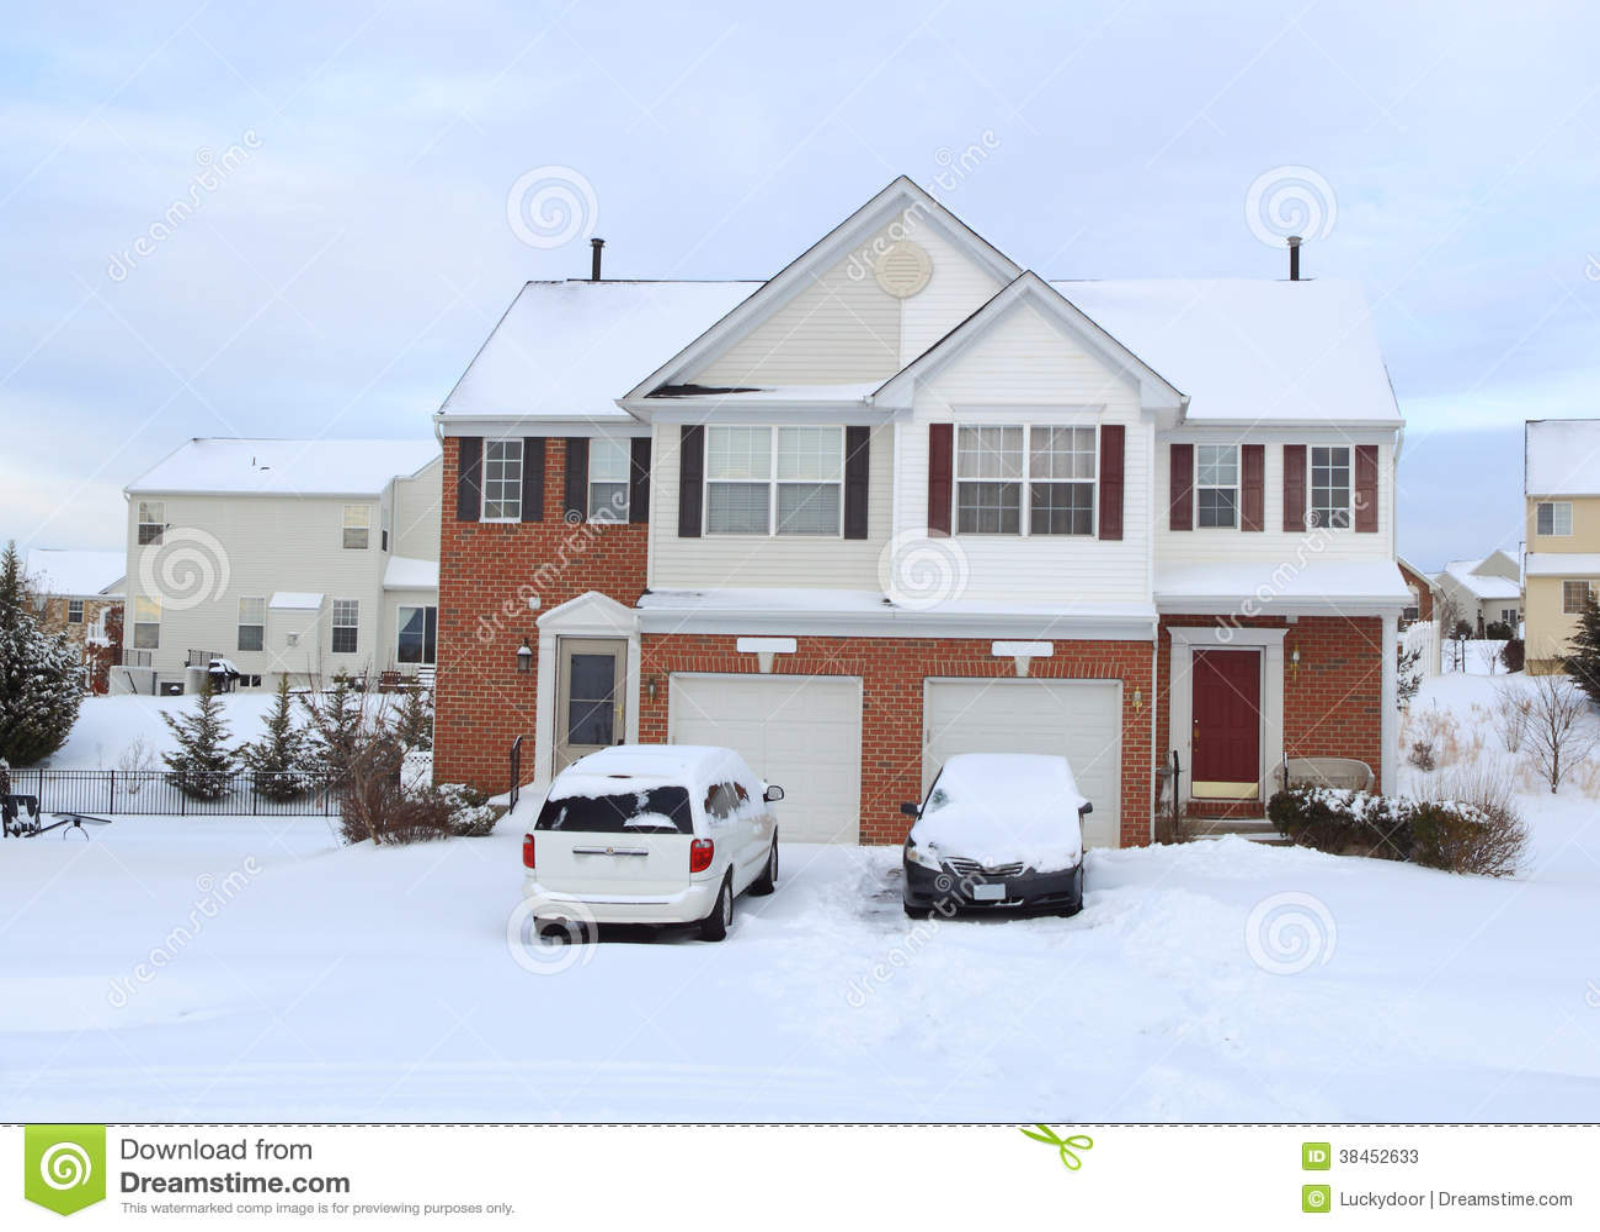 Duplex homes stock photos image 38452633 for Duplex builders